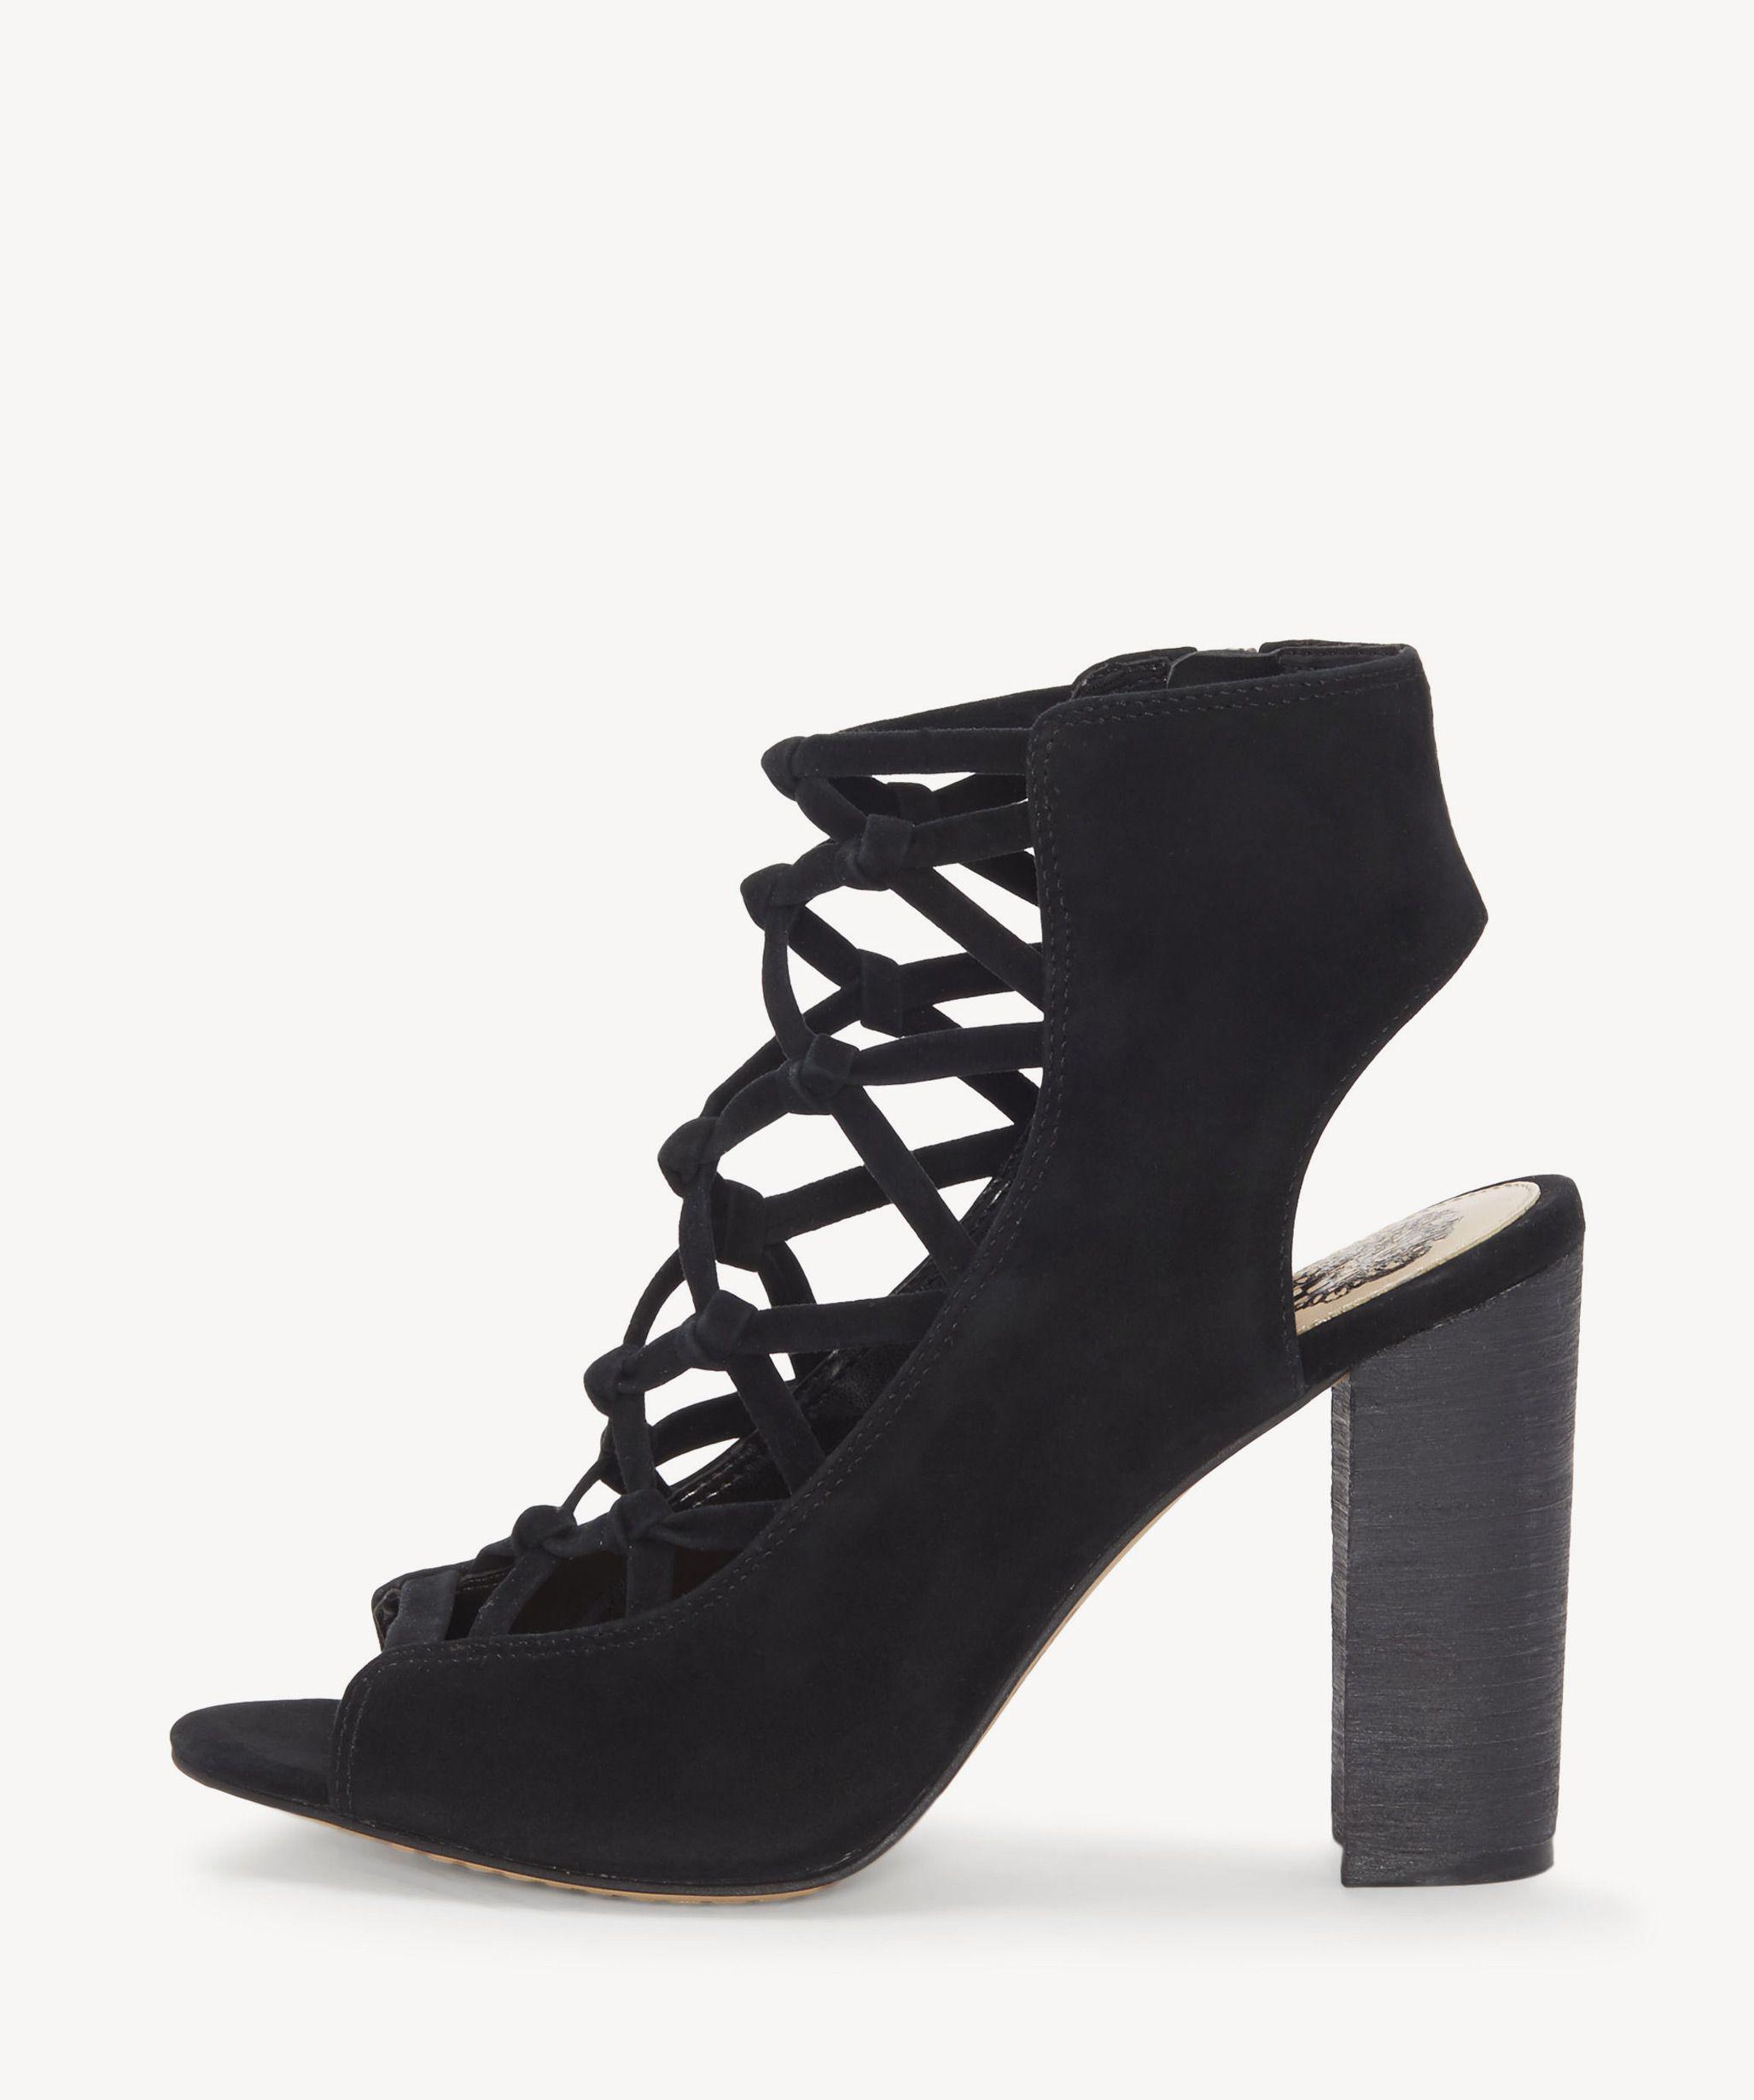 8e21e4d30090 Lyst - Vince Camuto Stesha Corset Block Heel Sandal in Black